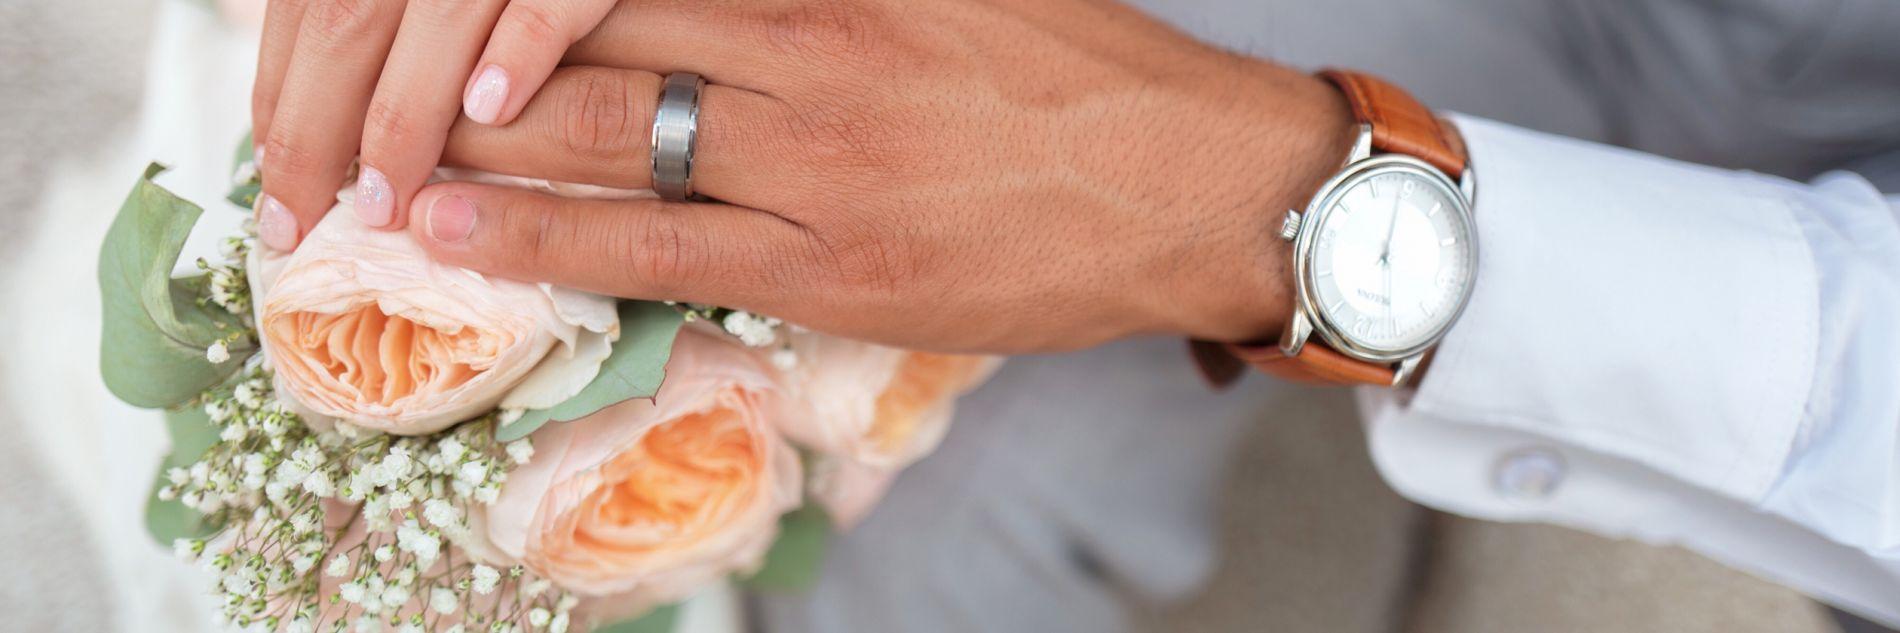 Svadba akcie 3.jpg